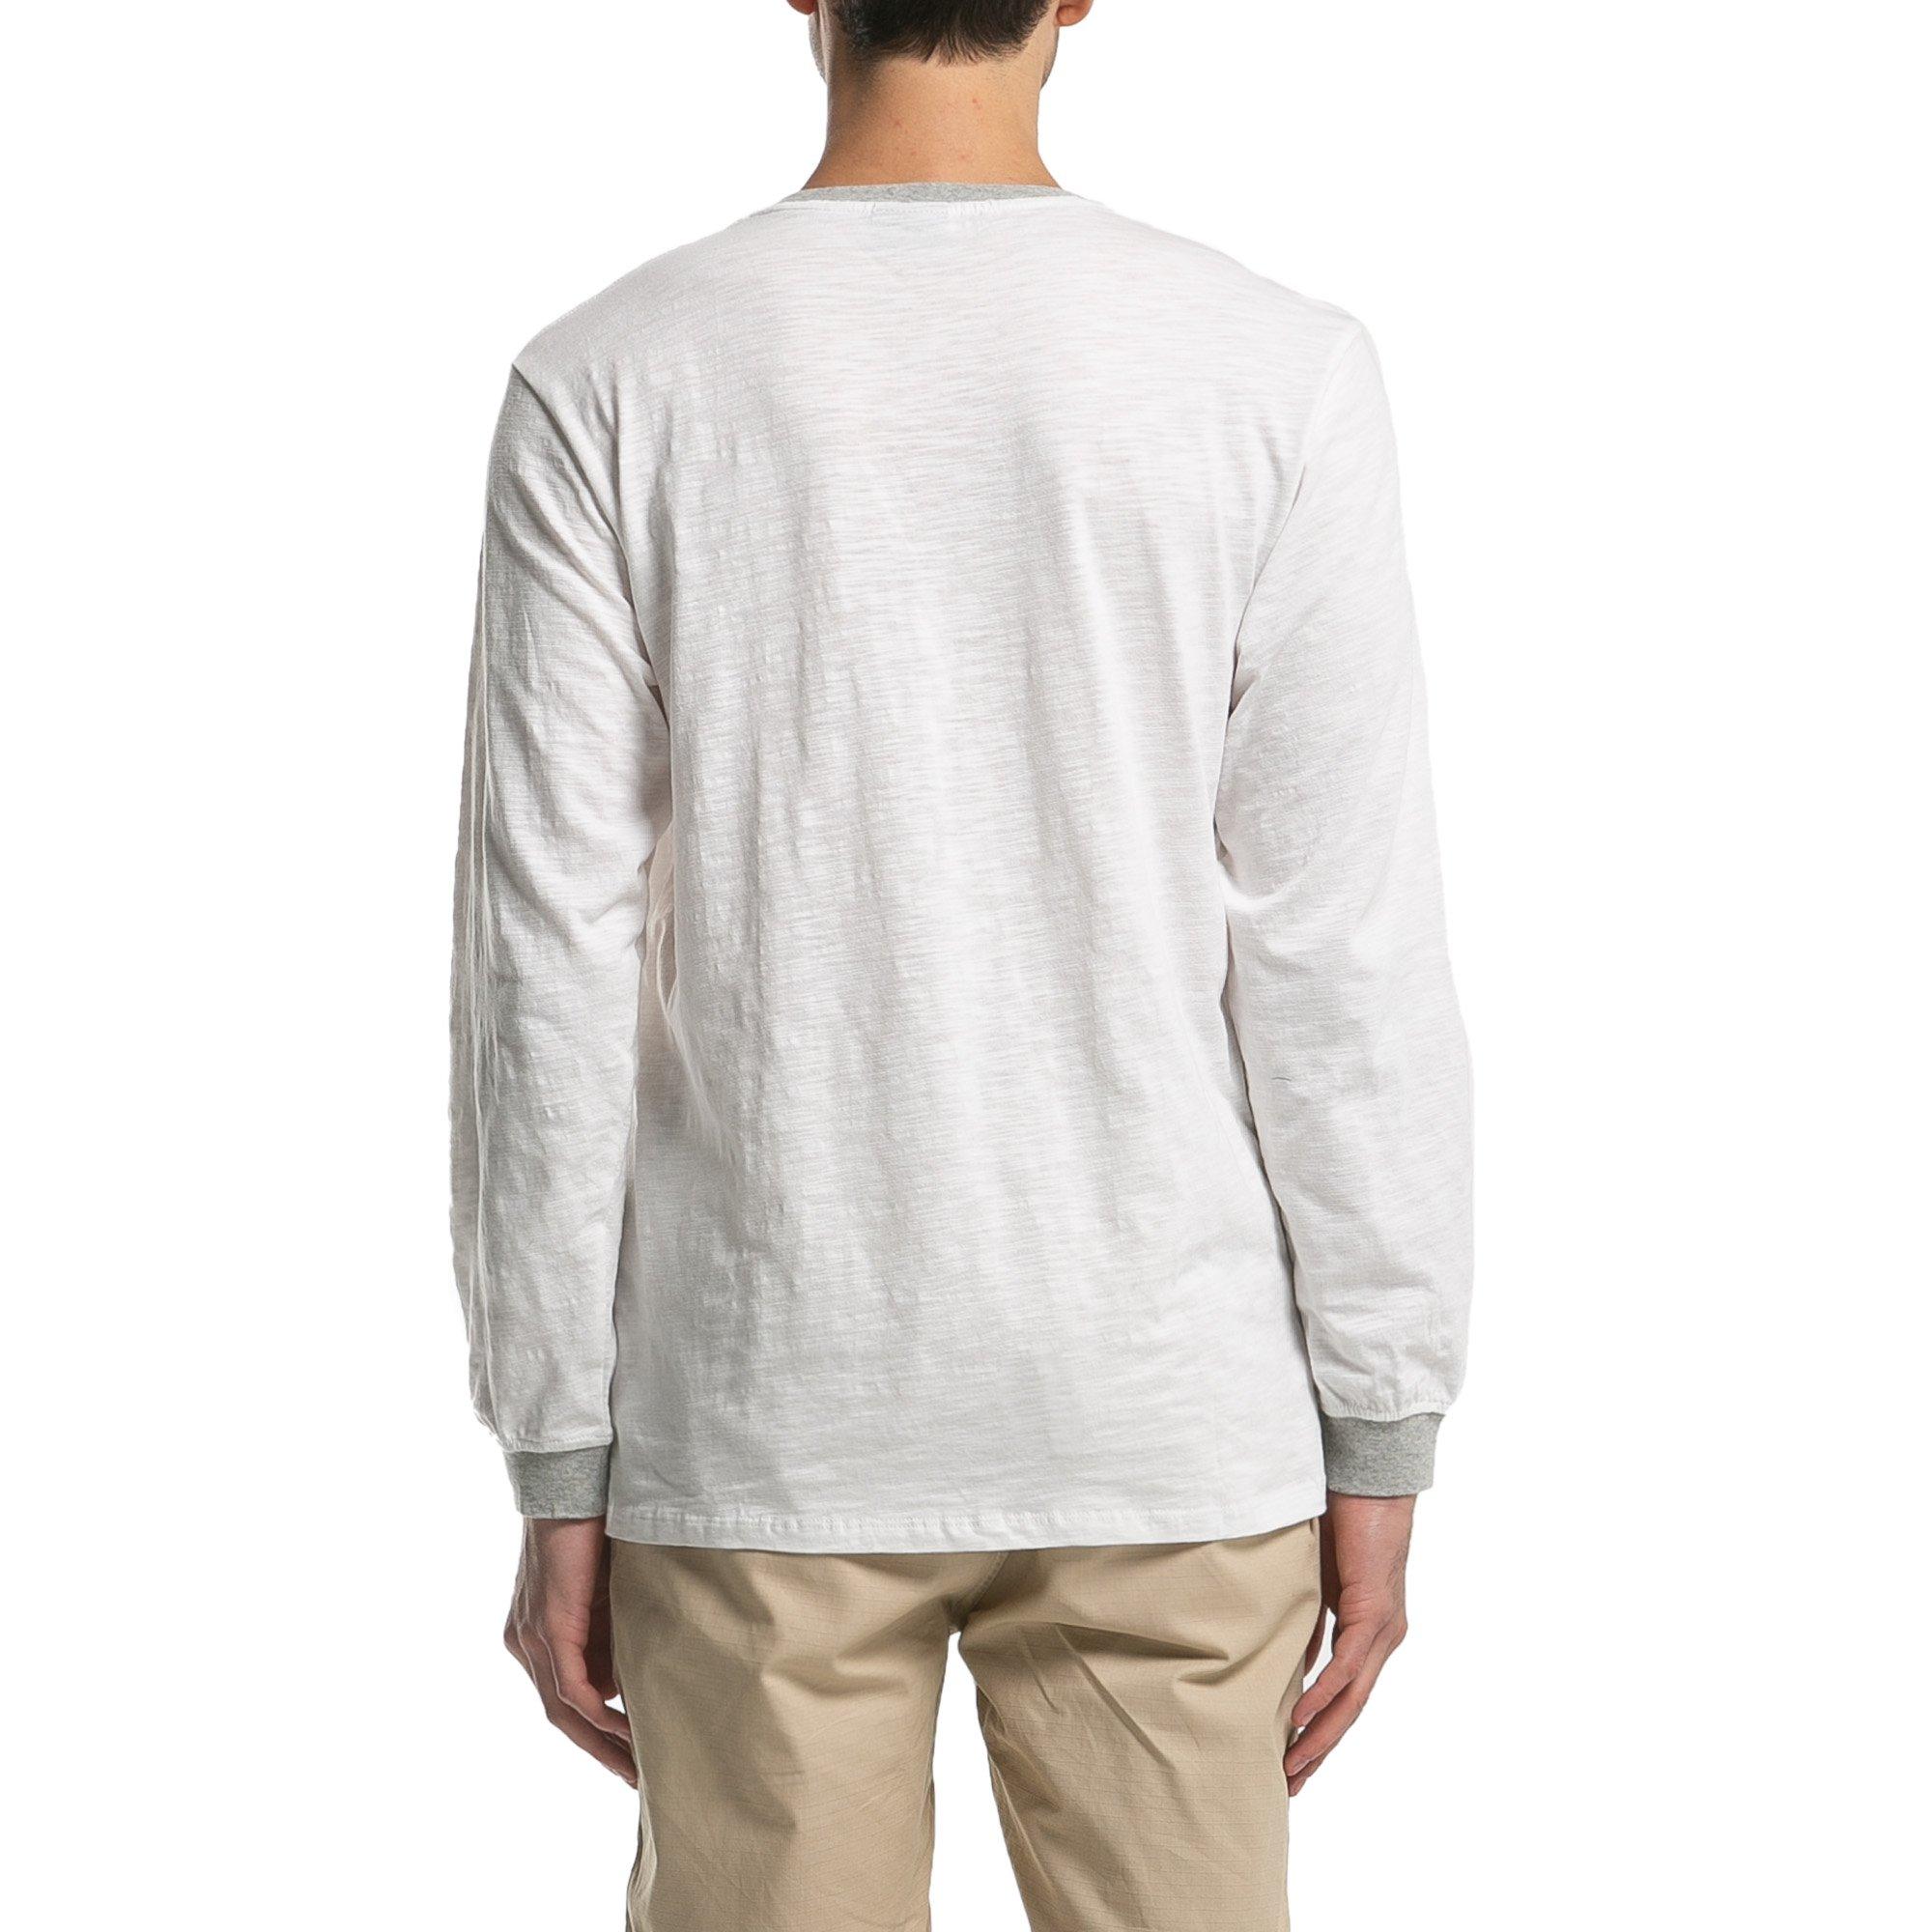 【PUBLISH BRAND/パブリッシュブランド】CORNELL  ポケットTシャツ / WHITE